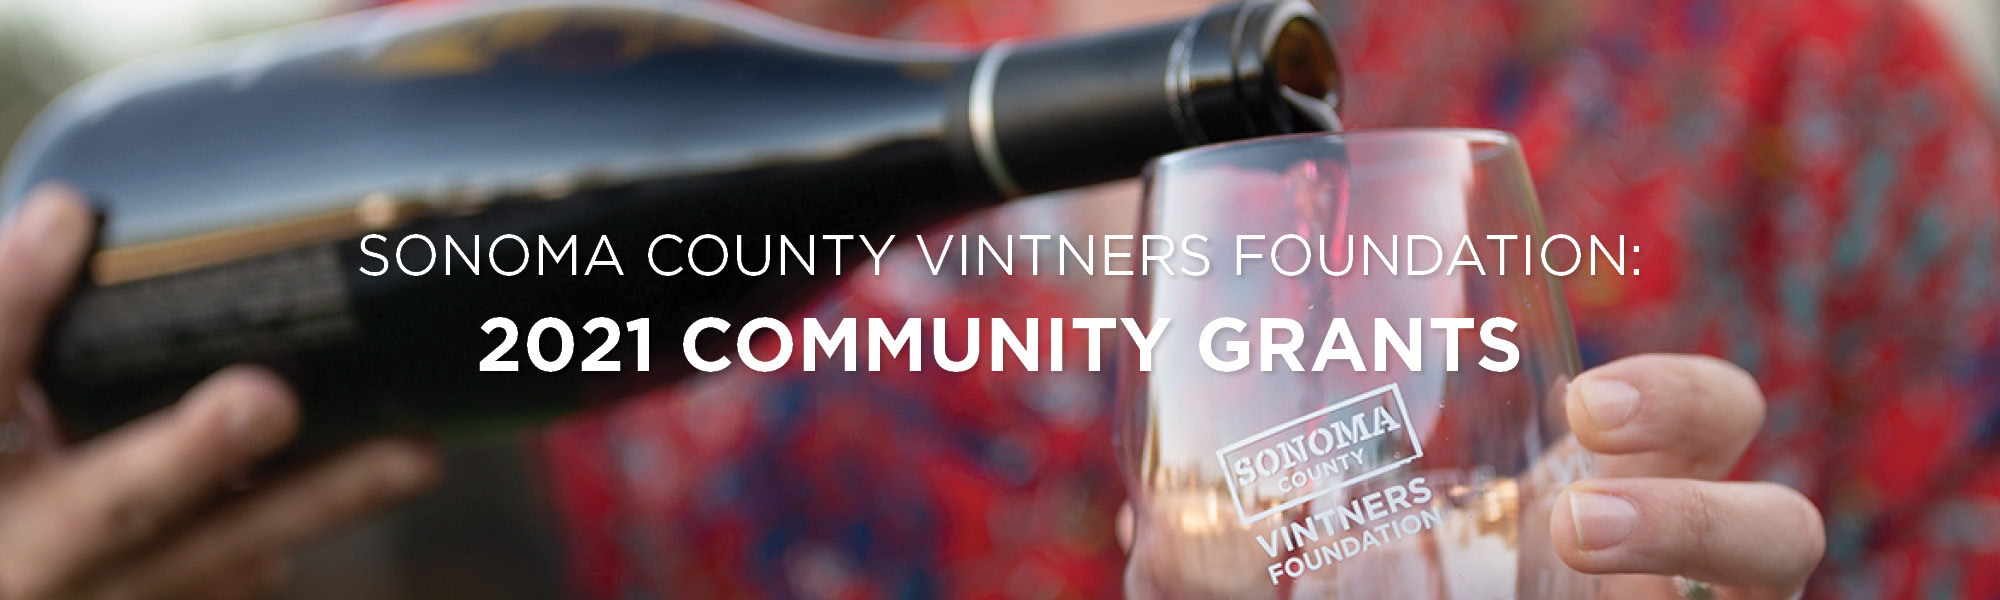 Sonoma County Vintners Foundation 2021 Community Grants